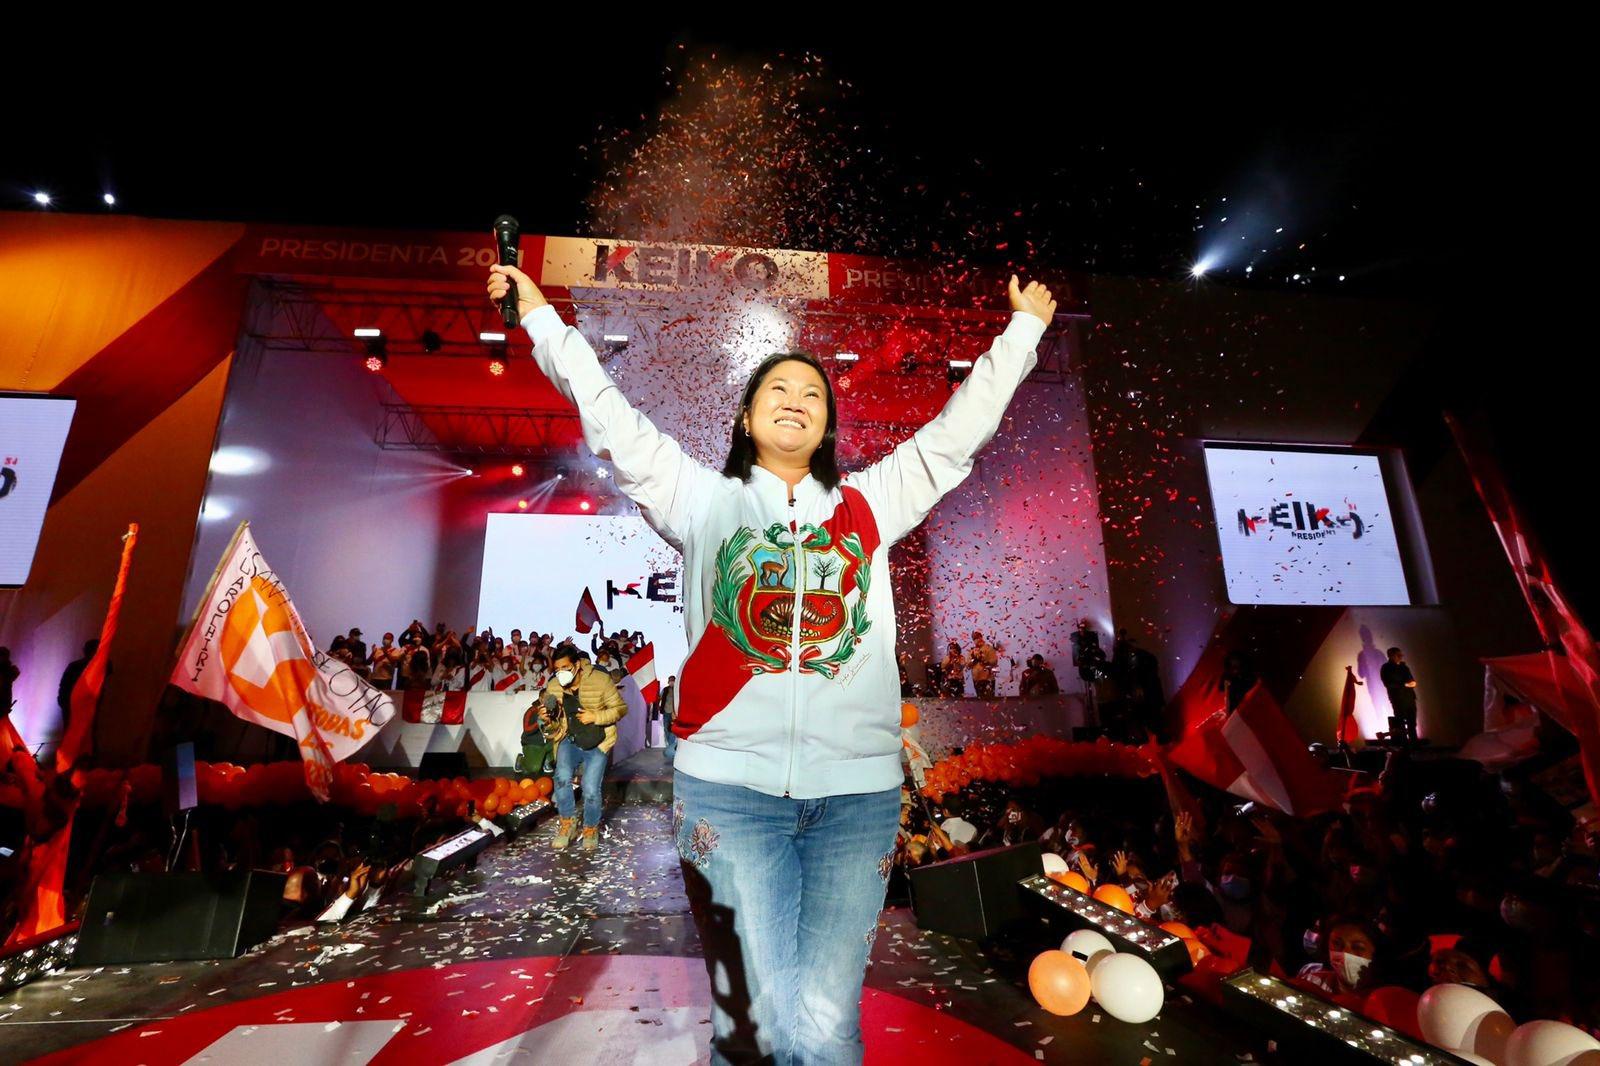 KEIKO FUJIMORI AVENTAJA ELECCIÓN PRESIDENCIAL EN PERÚ